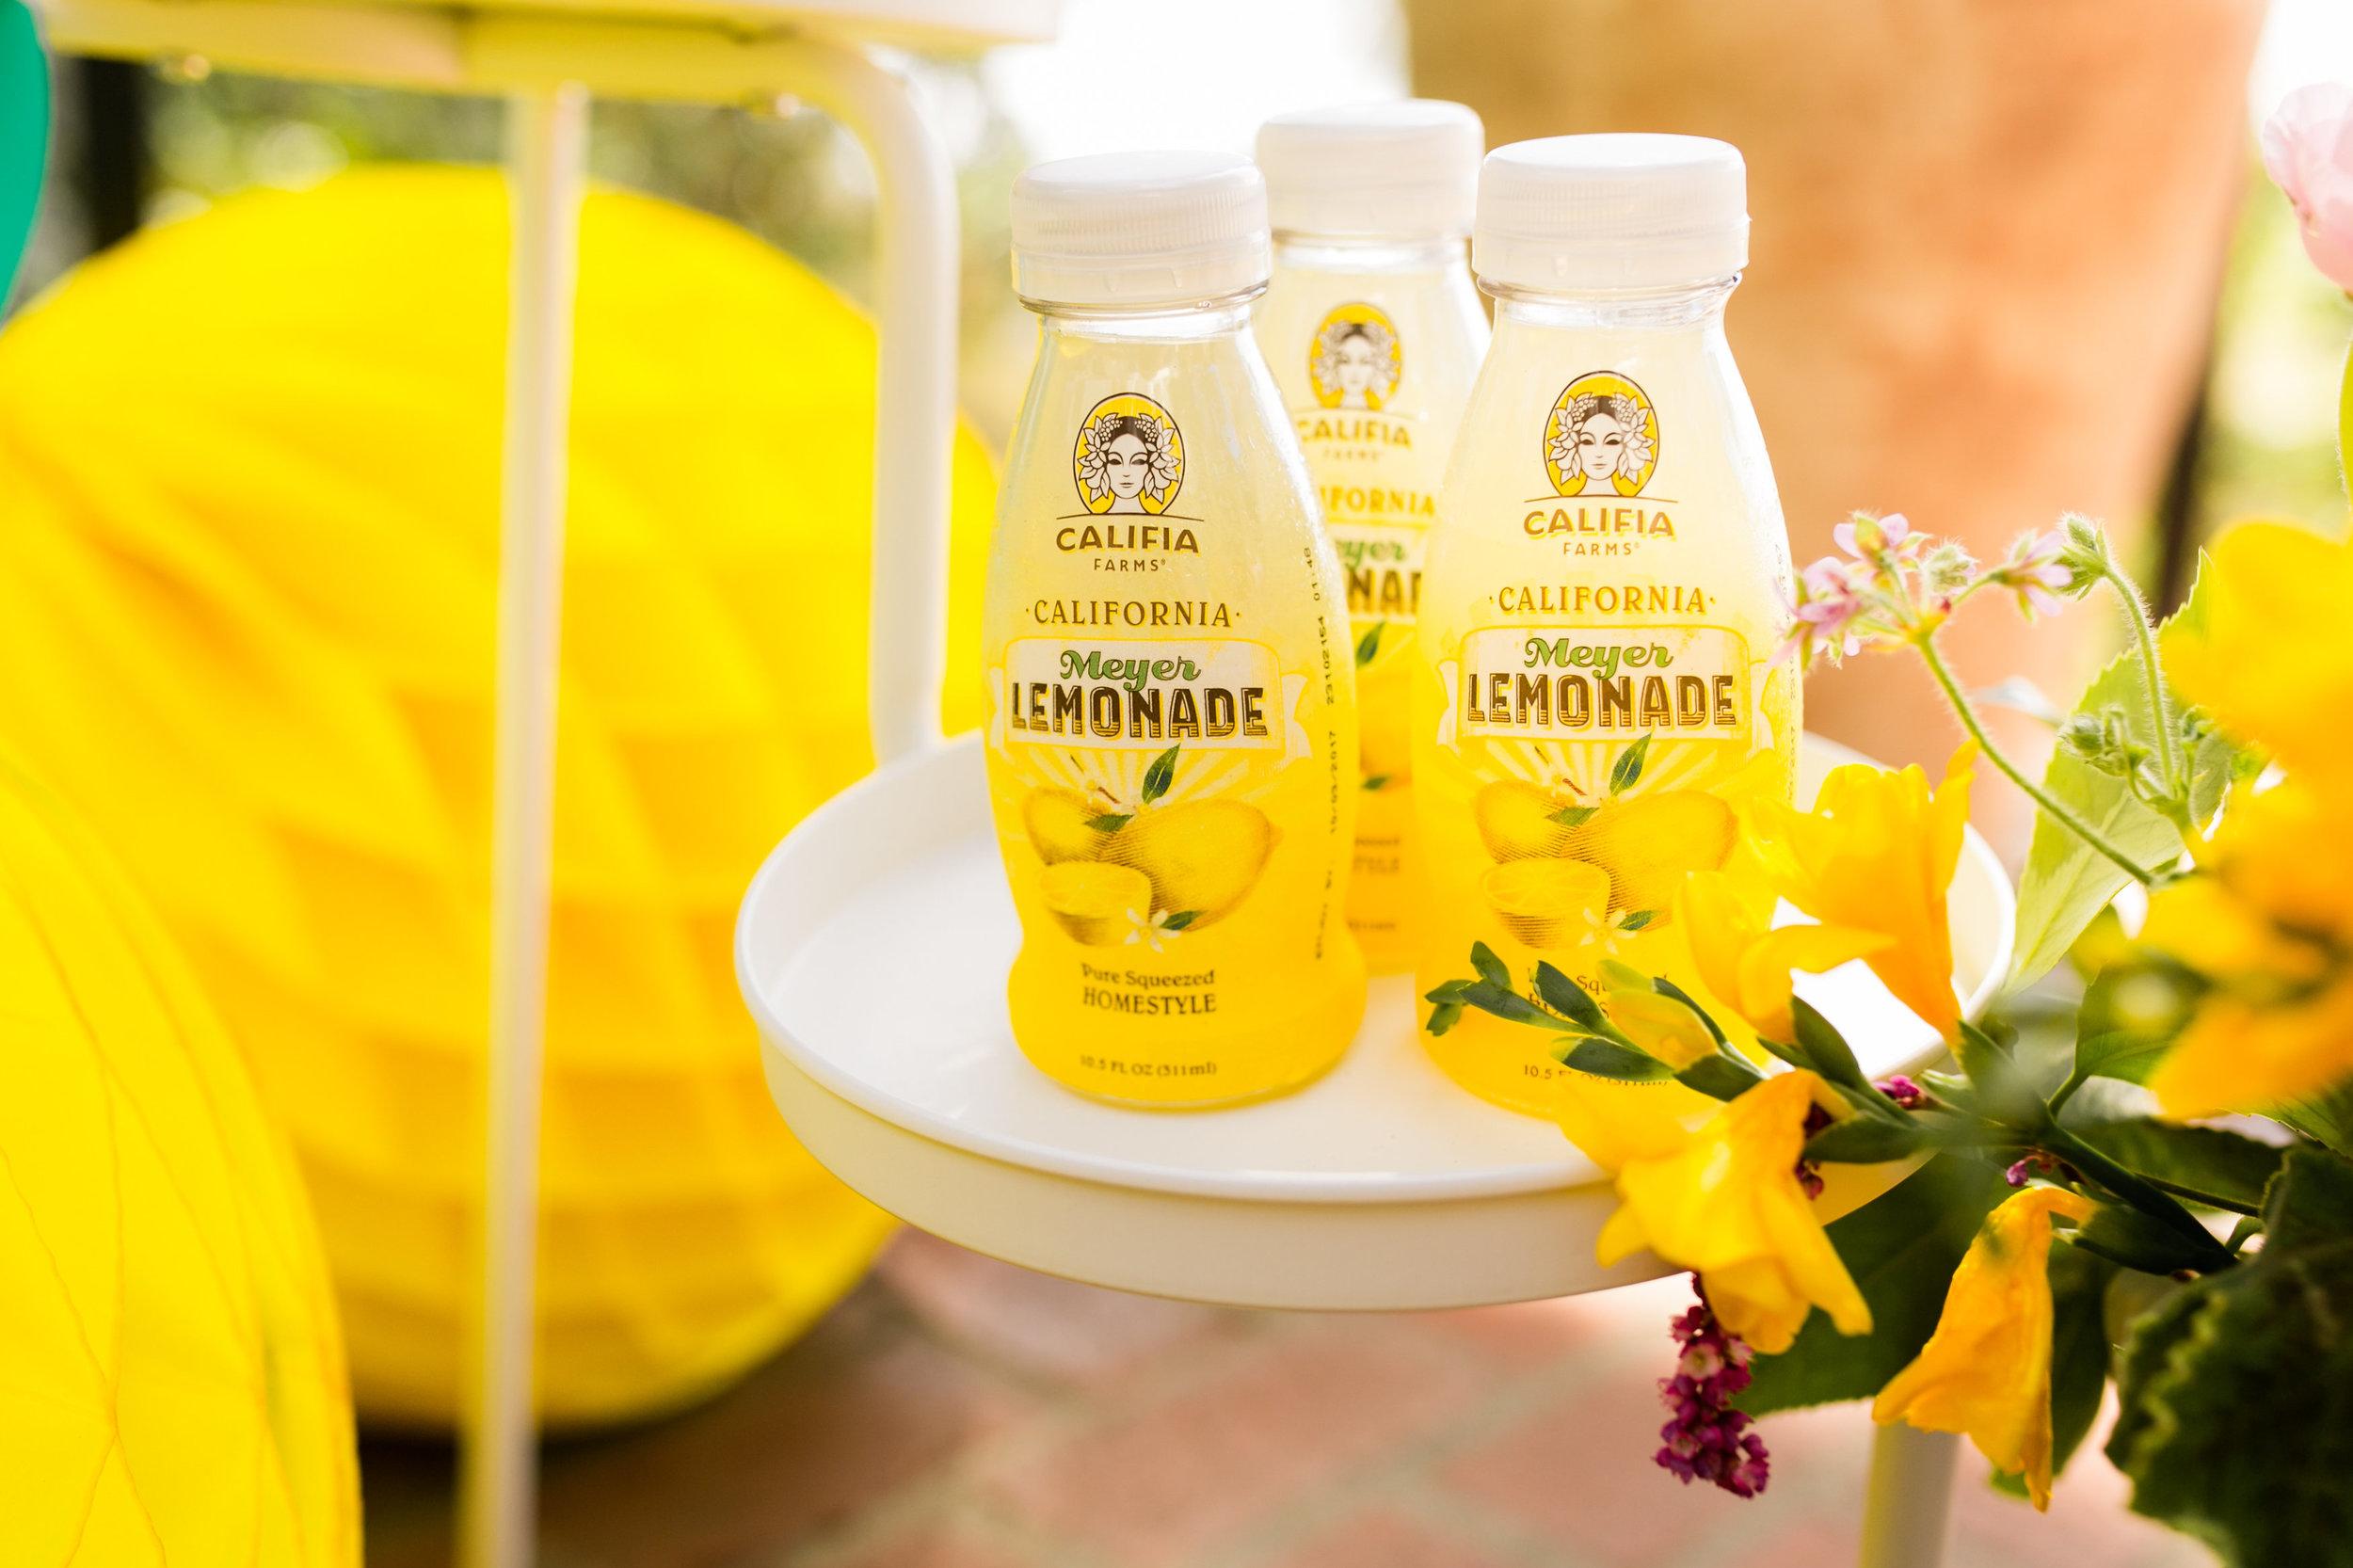 Lemonade Kids Birthday Party - Lemonade provided by Califia Farms